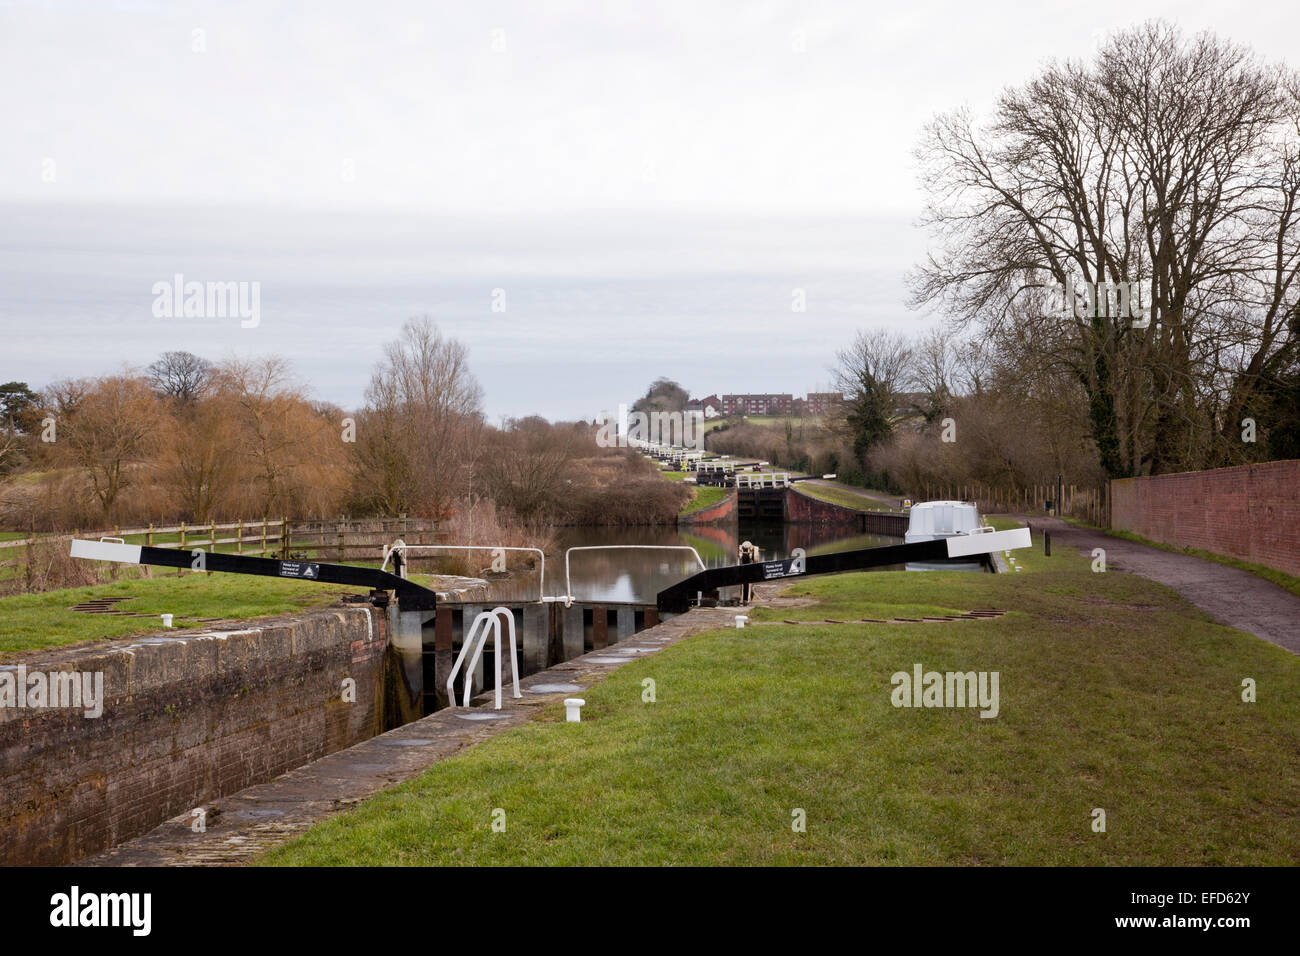 Caen Hill locks, Devizes, Wiltshire - Stock Image